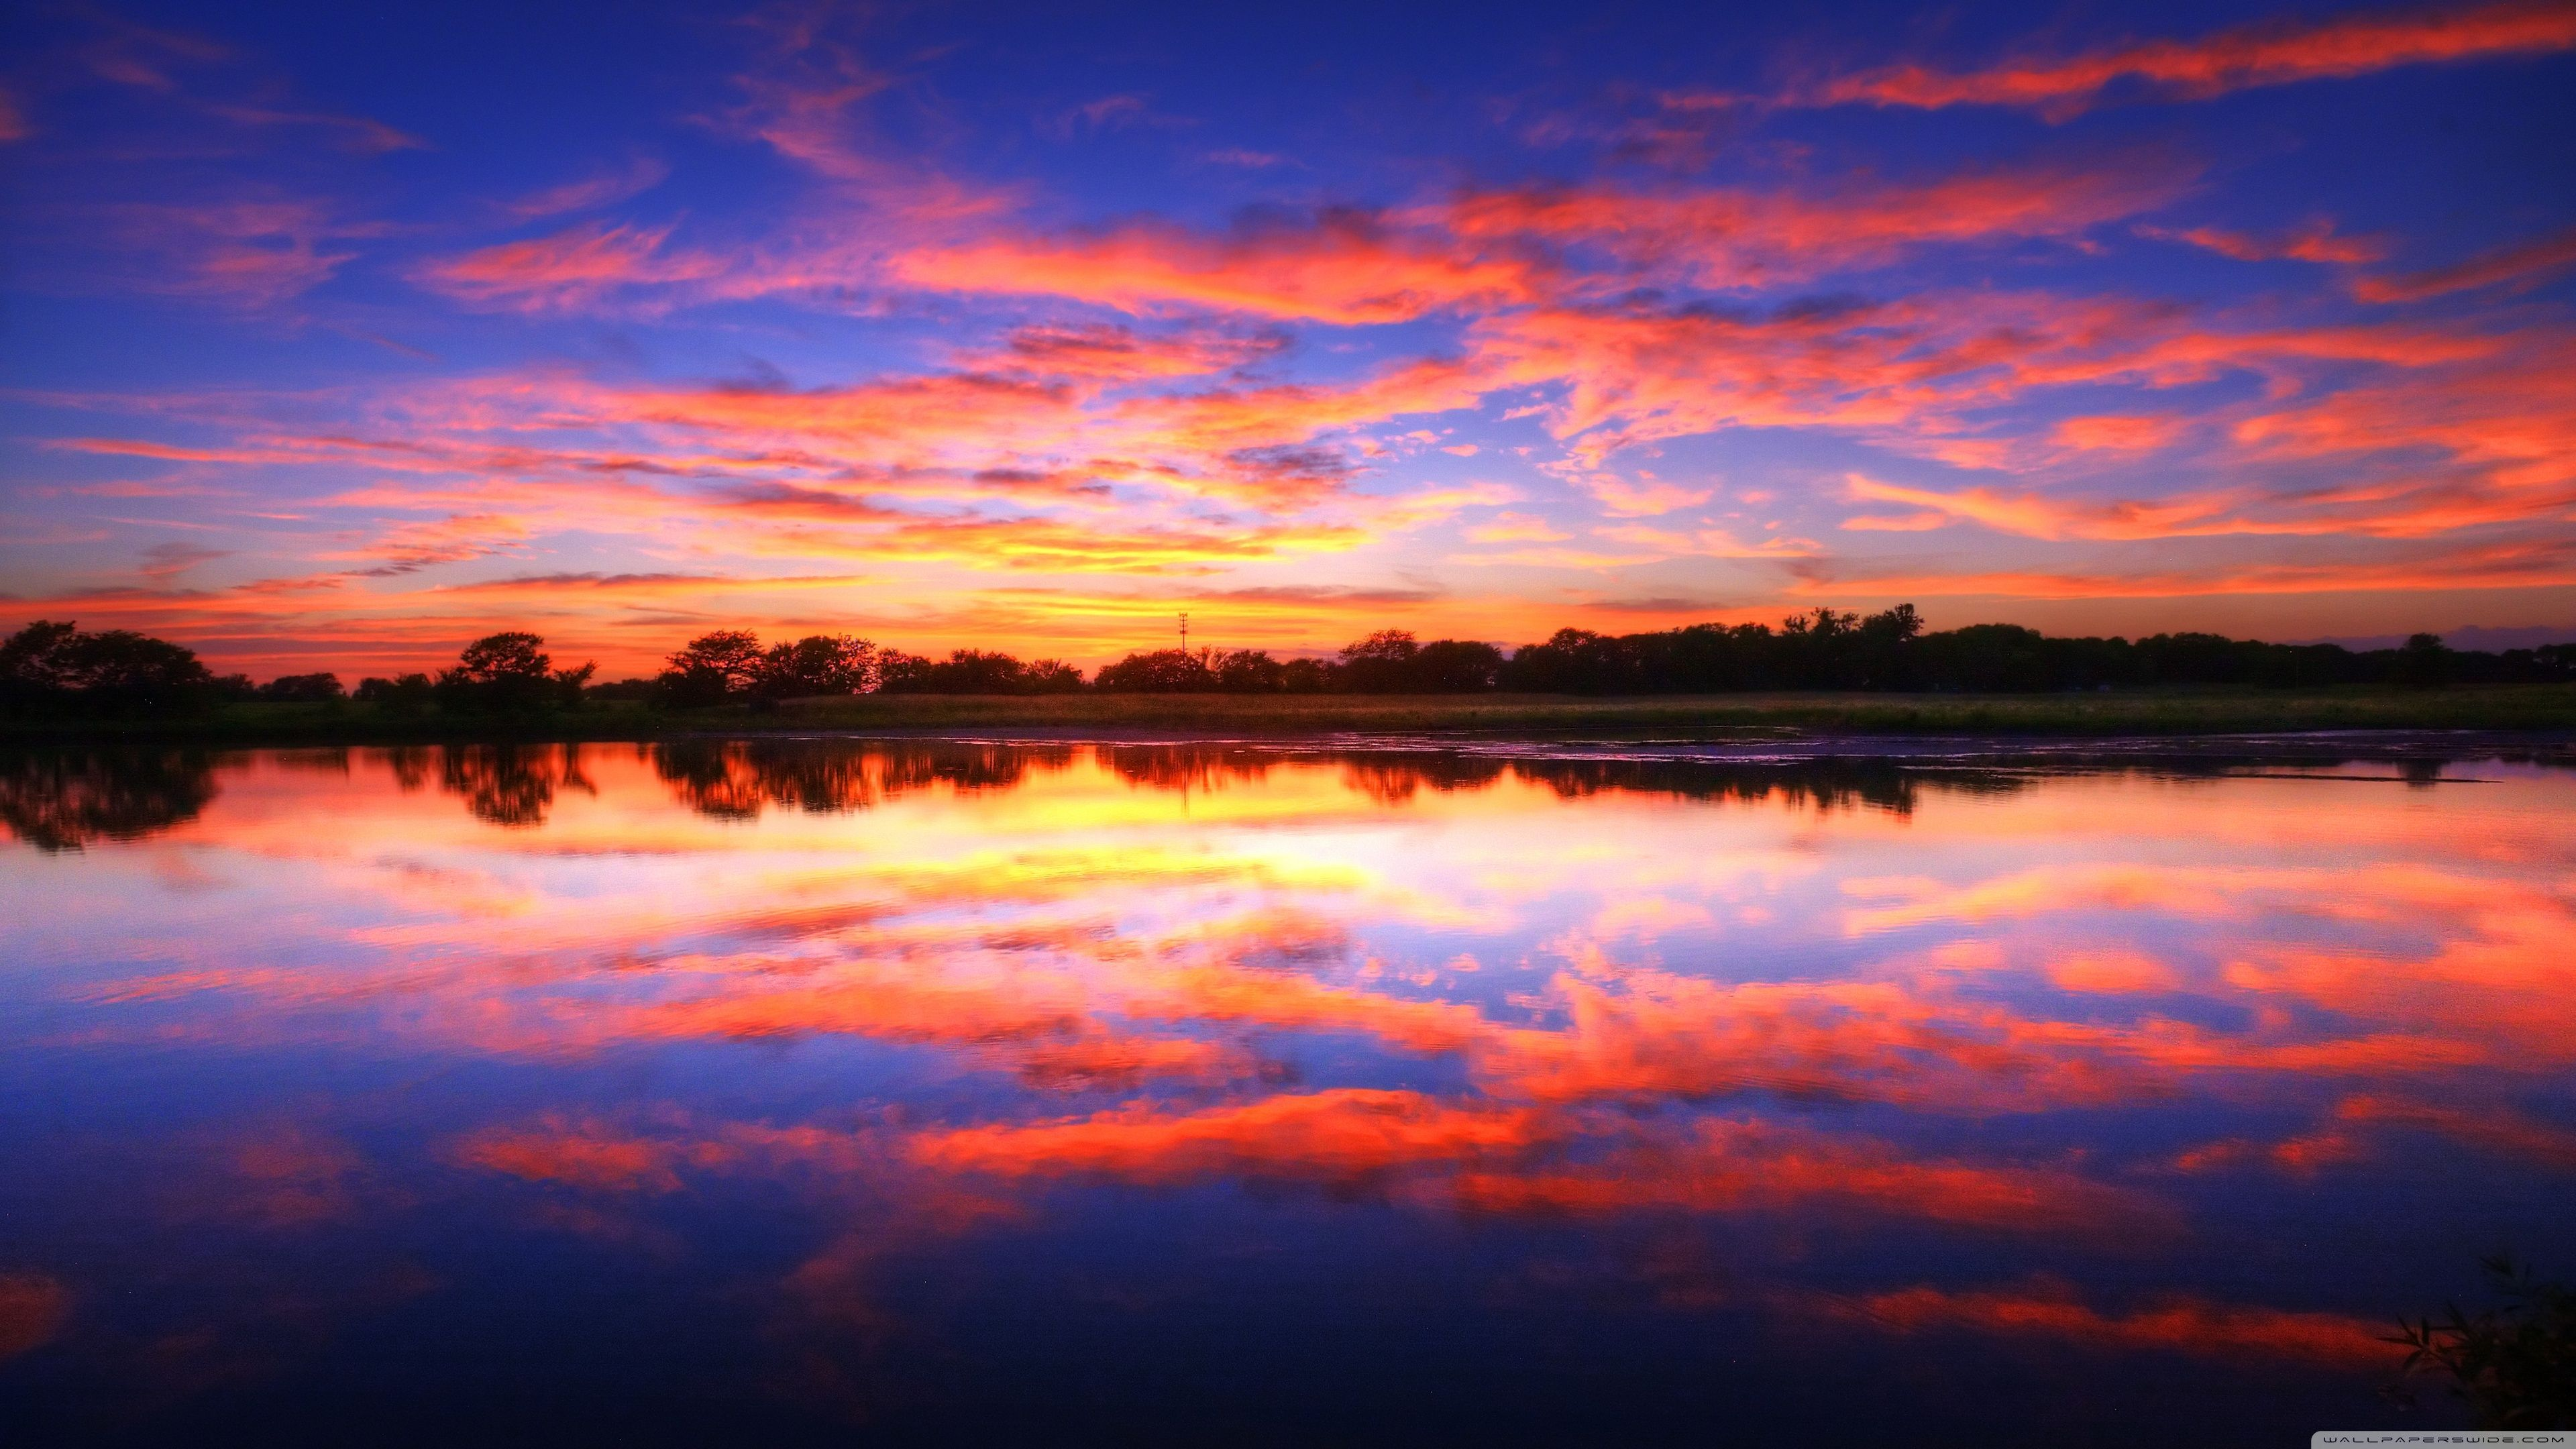 4k Ultra Hd Sunset Wallpapers Top Free 4k Ultra Hd Sunset Backgrounds Wallpaperaccess